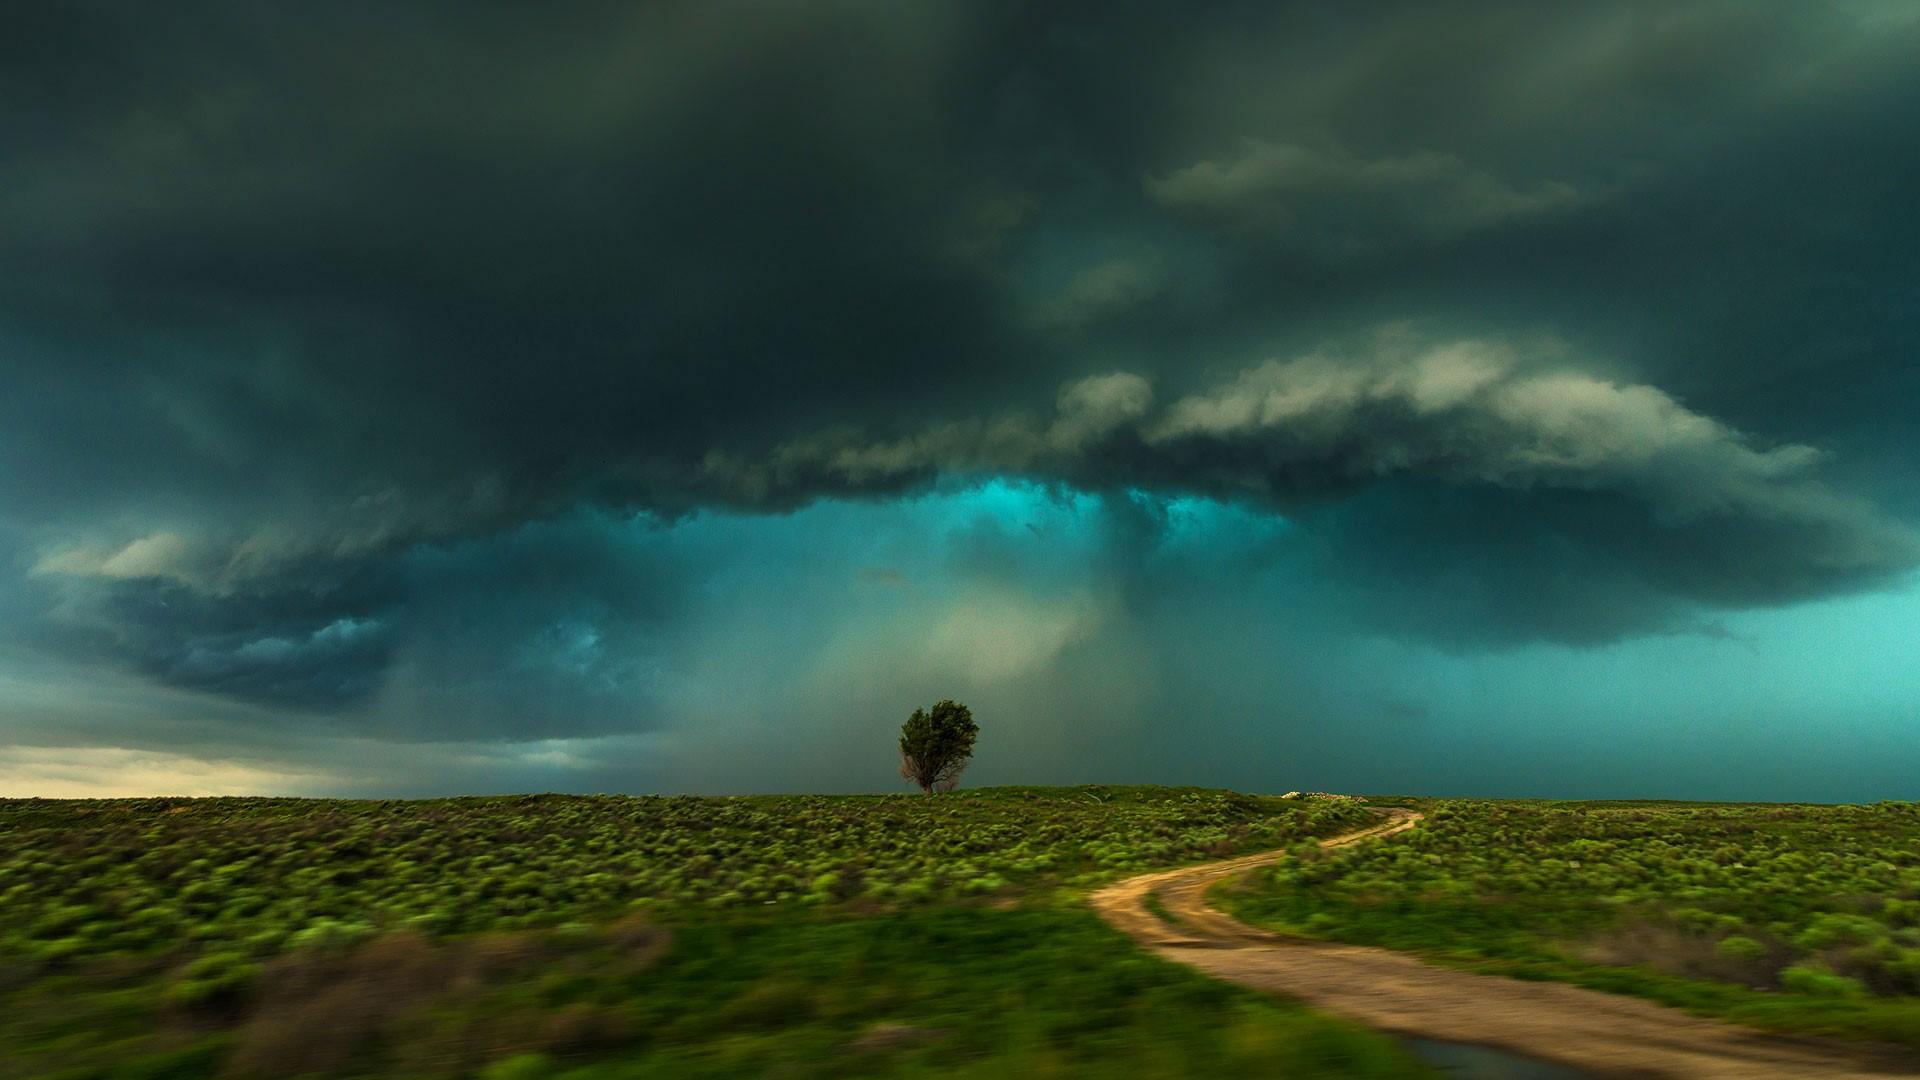 Shelf cloud storm, Lamar, Colorado, USA | Windows 10 ...